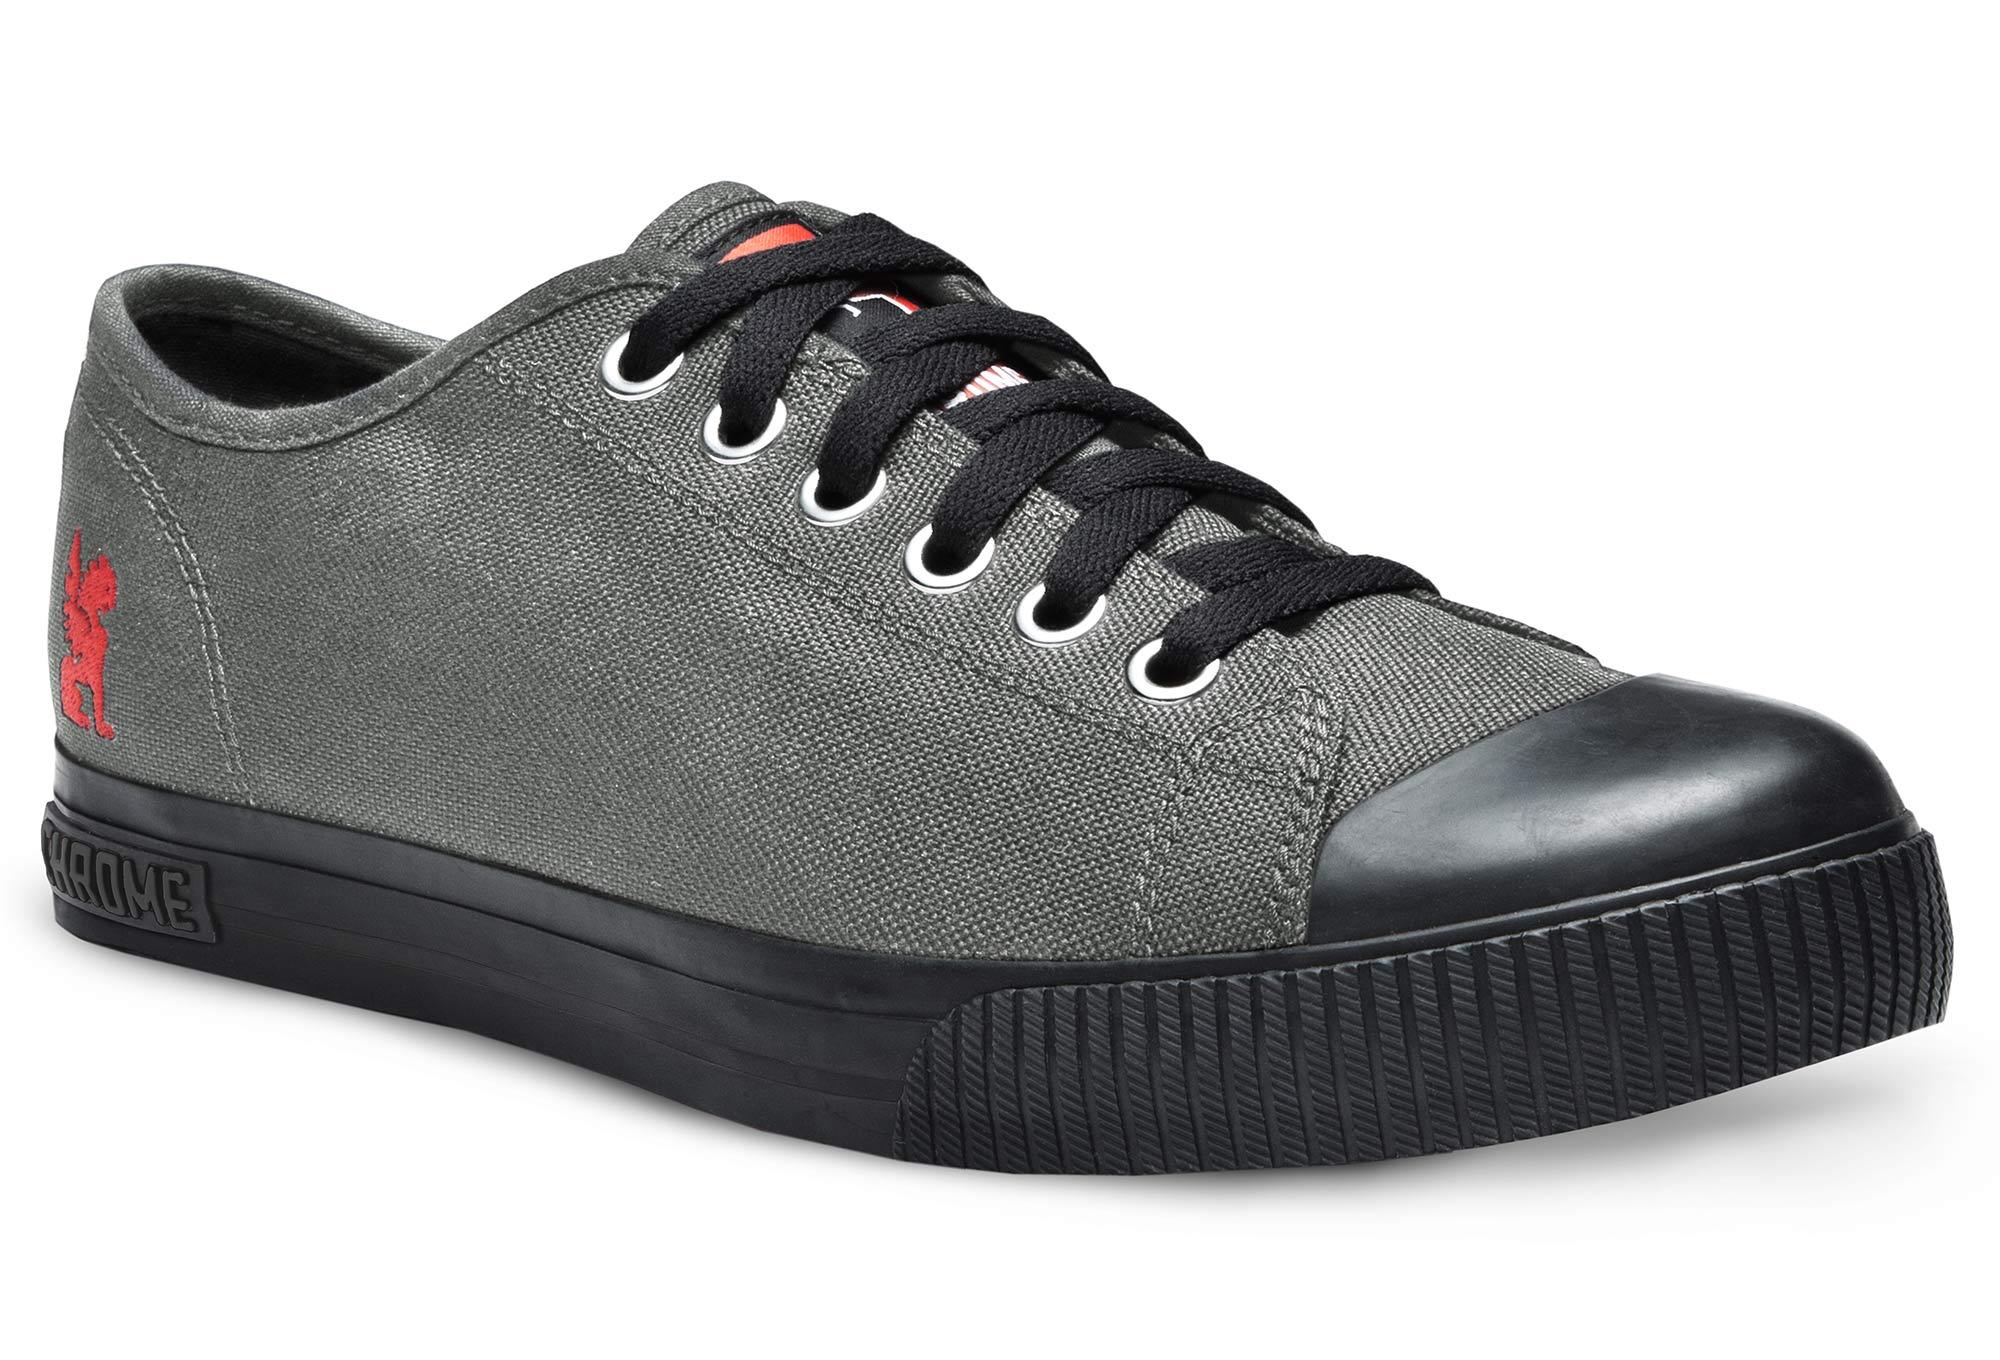 CHROME KURSK PRO SPD Shoes Grey Black